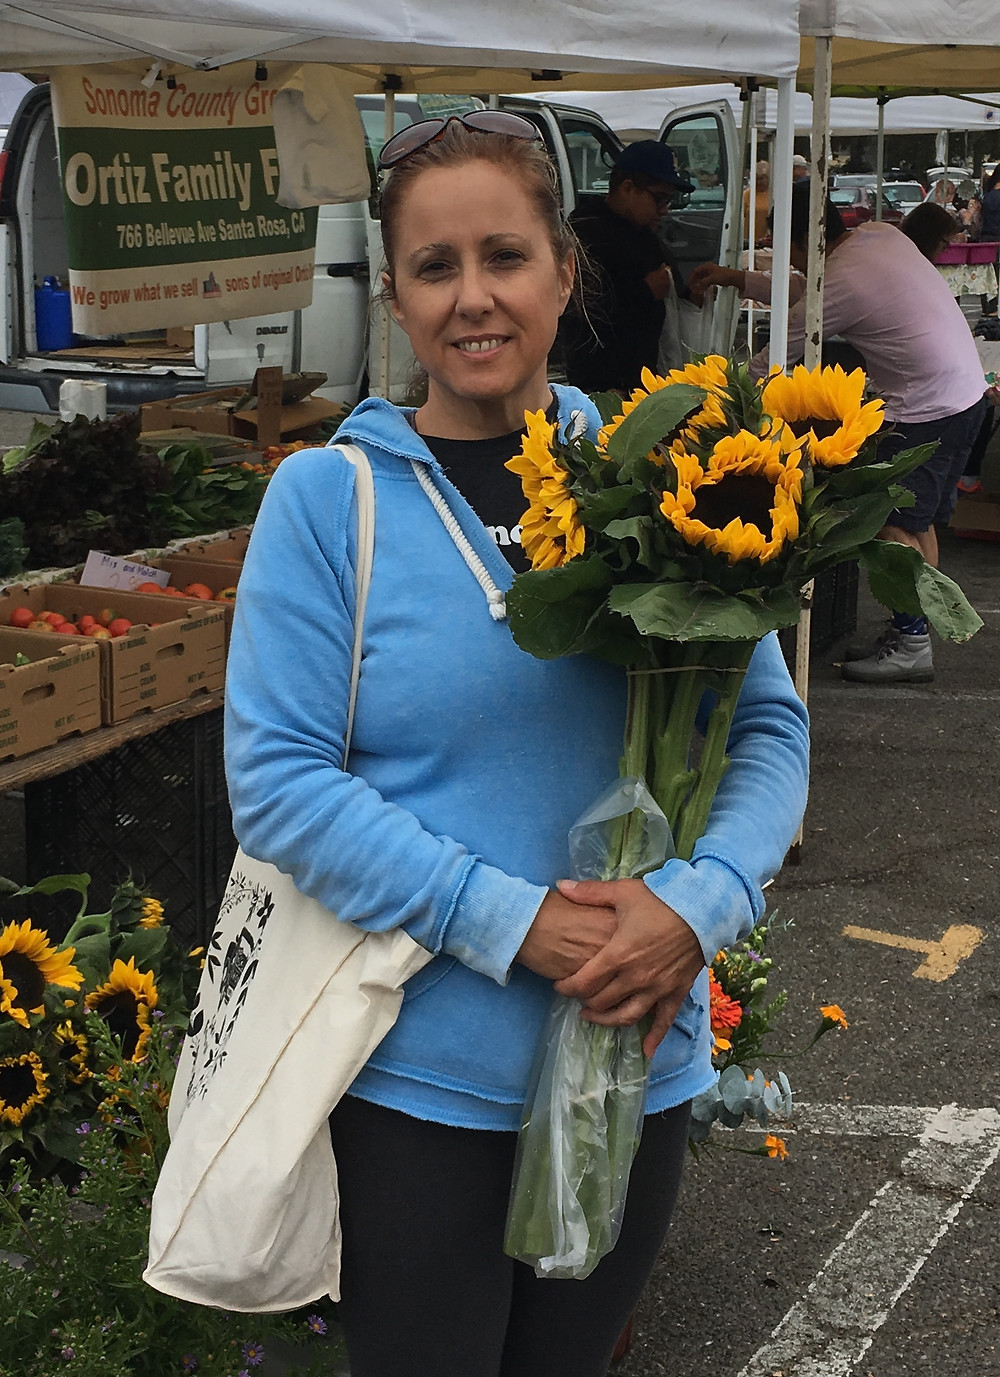 Scb attends farmers market. www.sonomacountybuilders.com